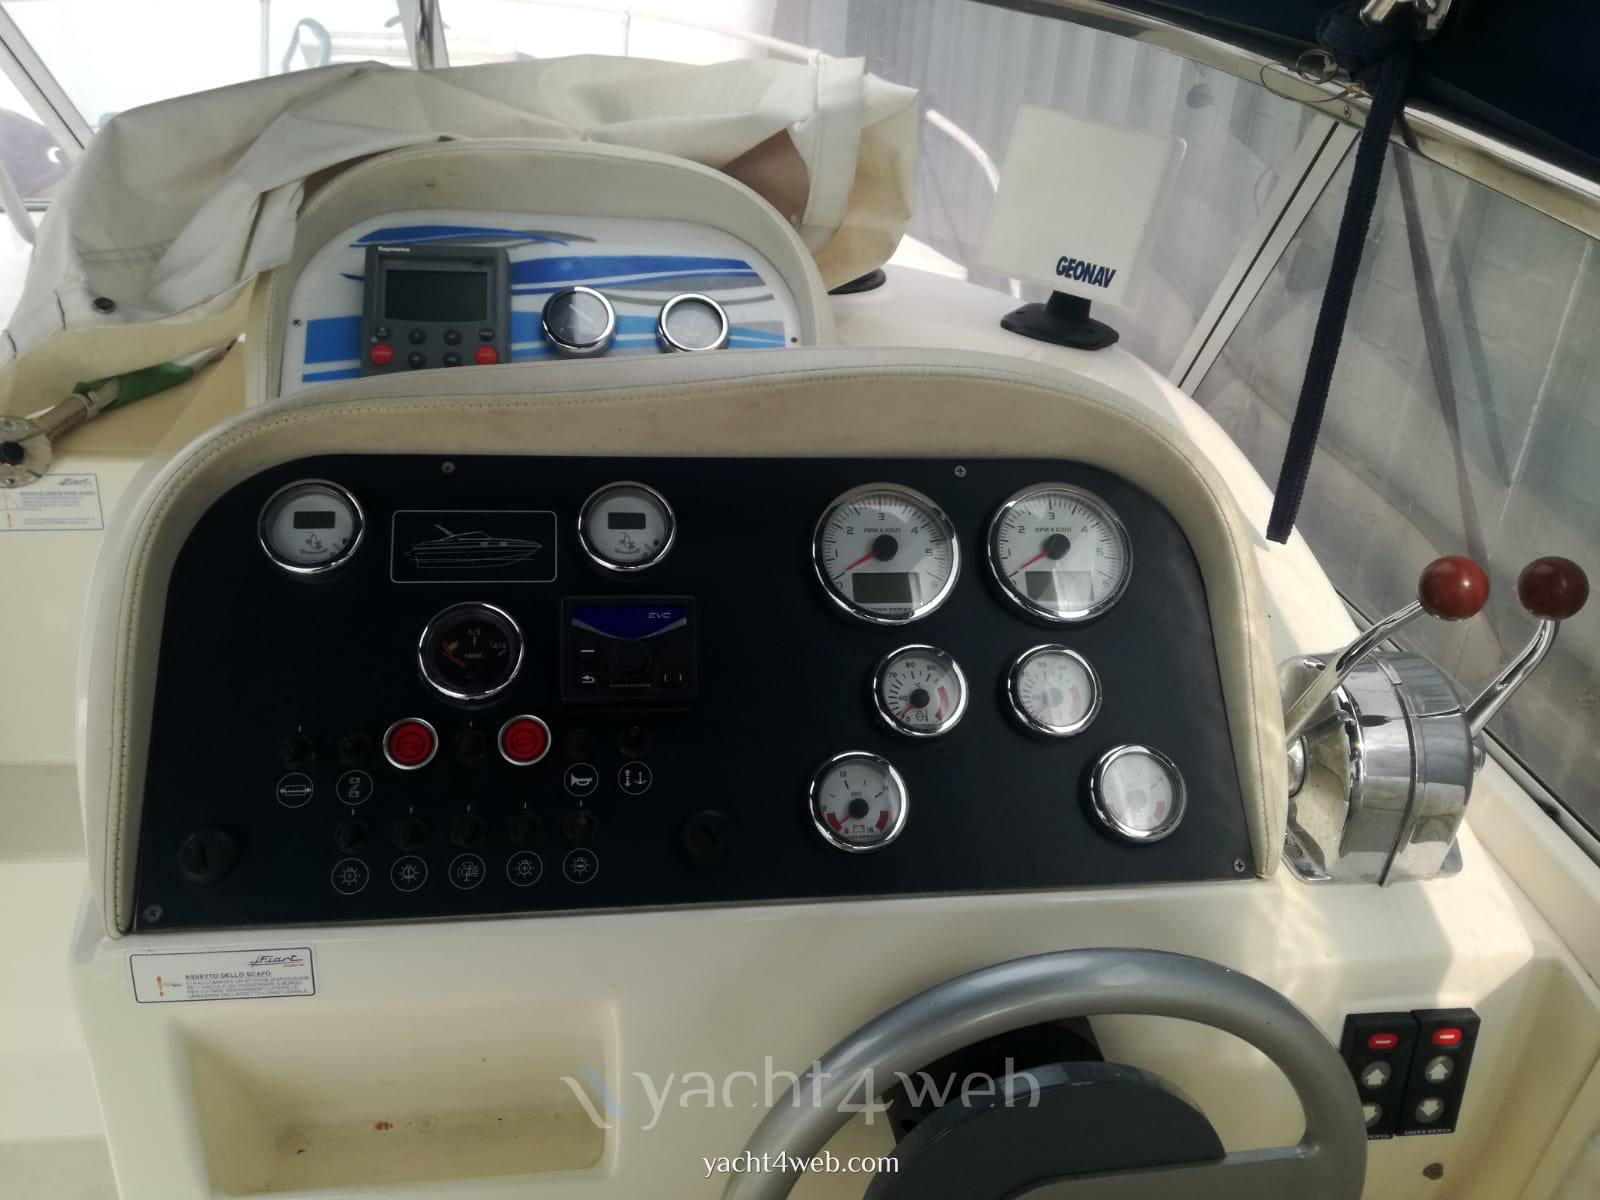 Fiart mare Fiart 28 genius barca a motore